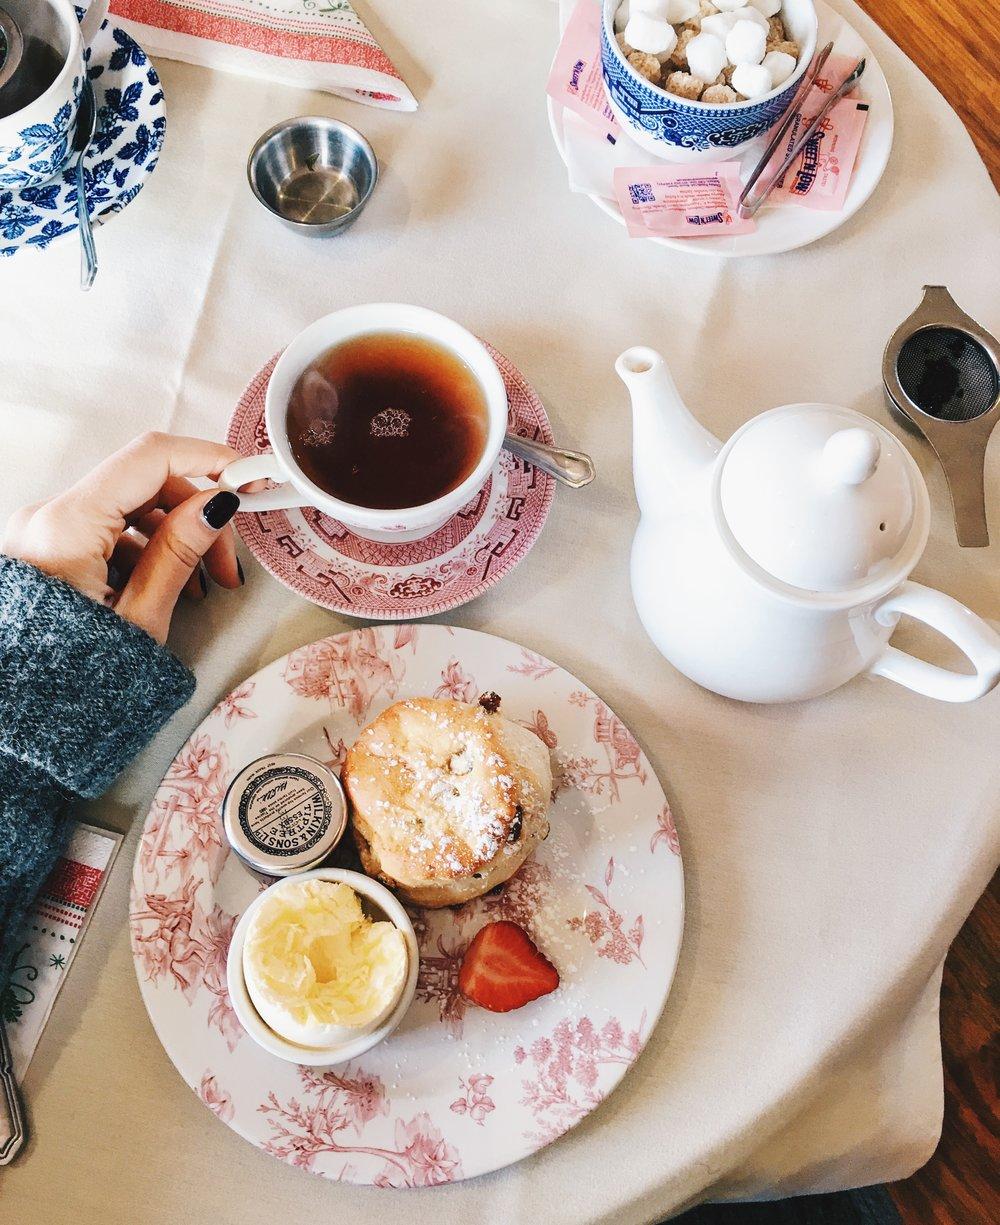 Cream Tea at the Jane Austen Centre Regency Tea Room, Bath